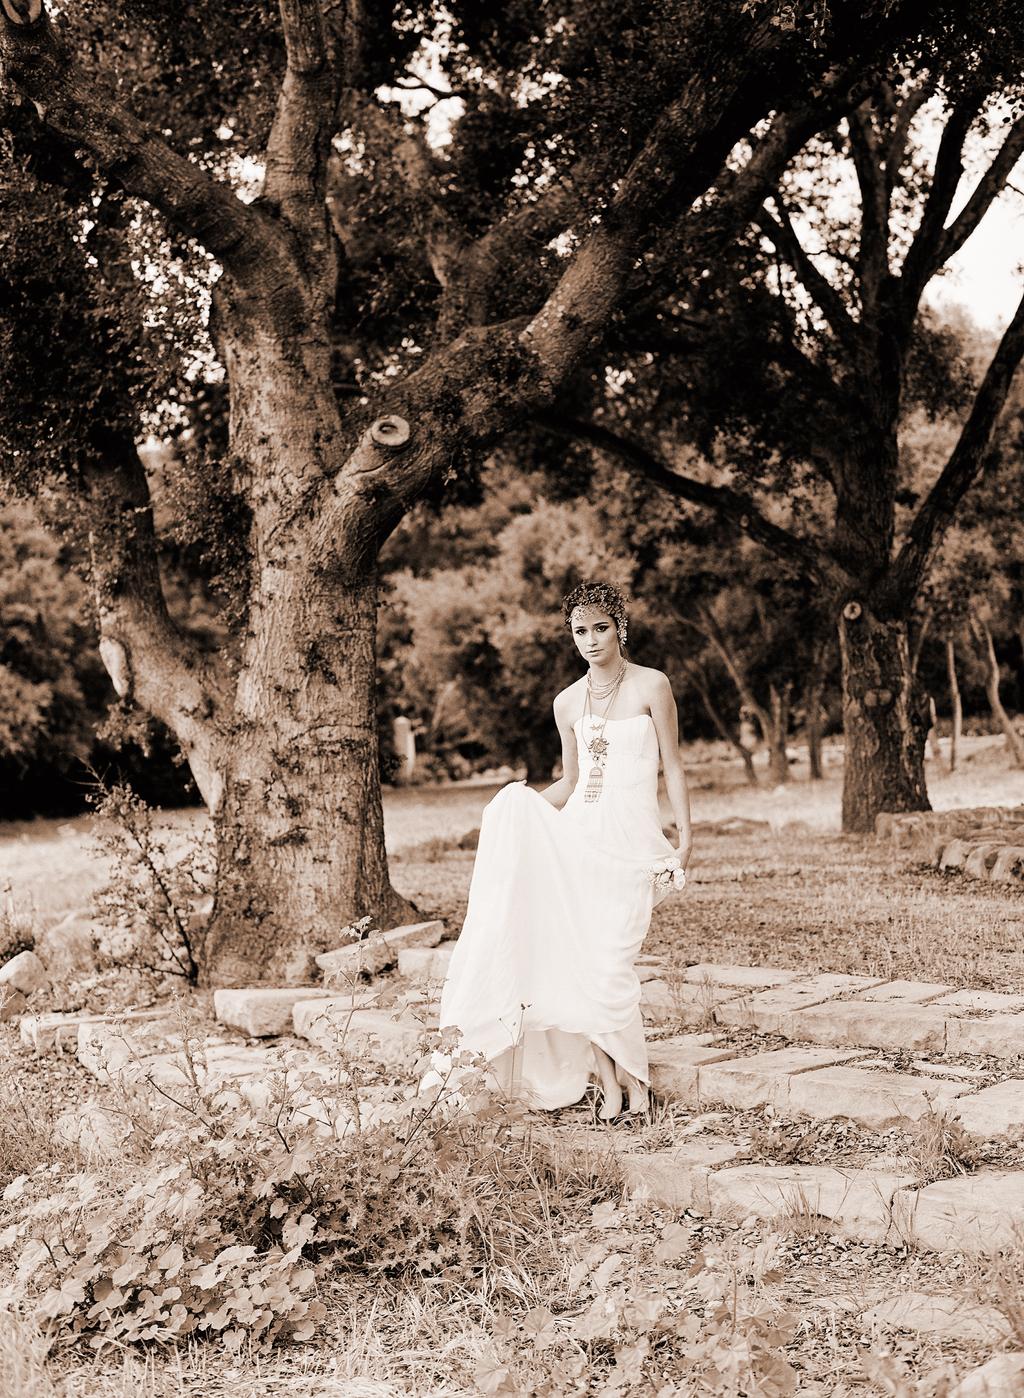 Styled-wedding-santa-barbara-chic-beaux-arts-phtographie-italian-bohemian-wedding-bride-wedding-dress-sepia-110.full